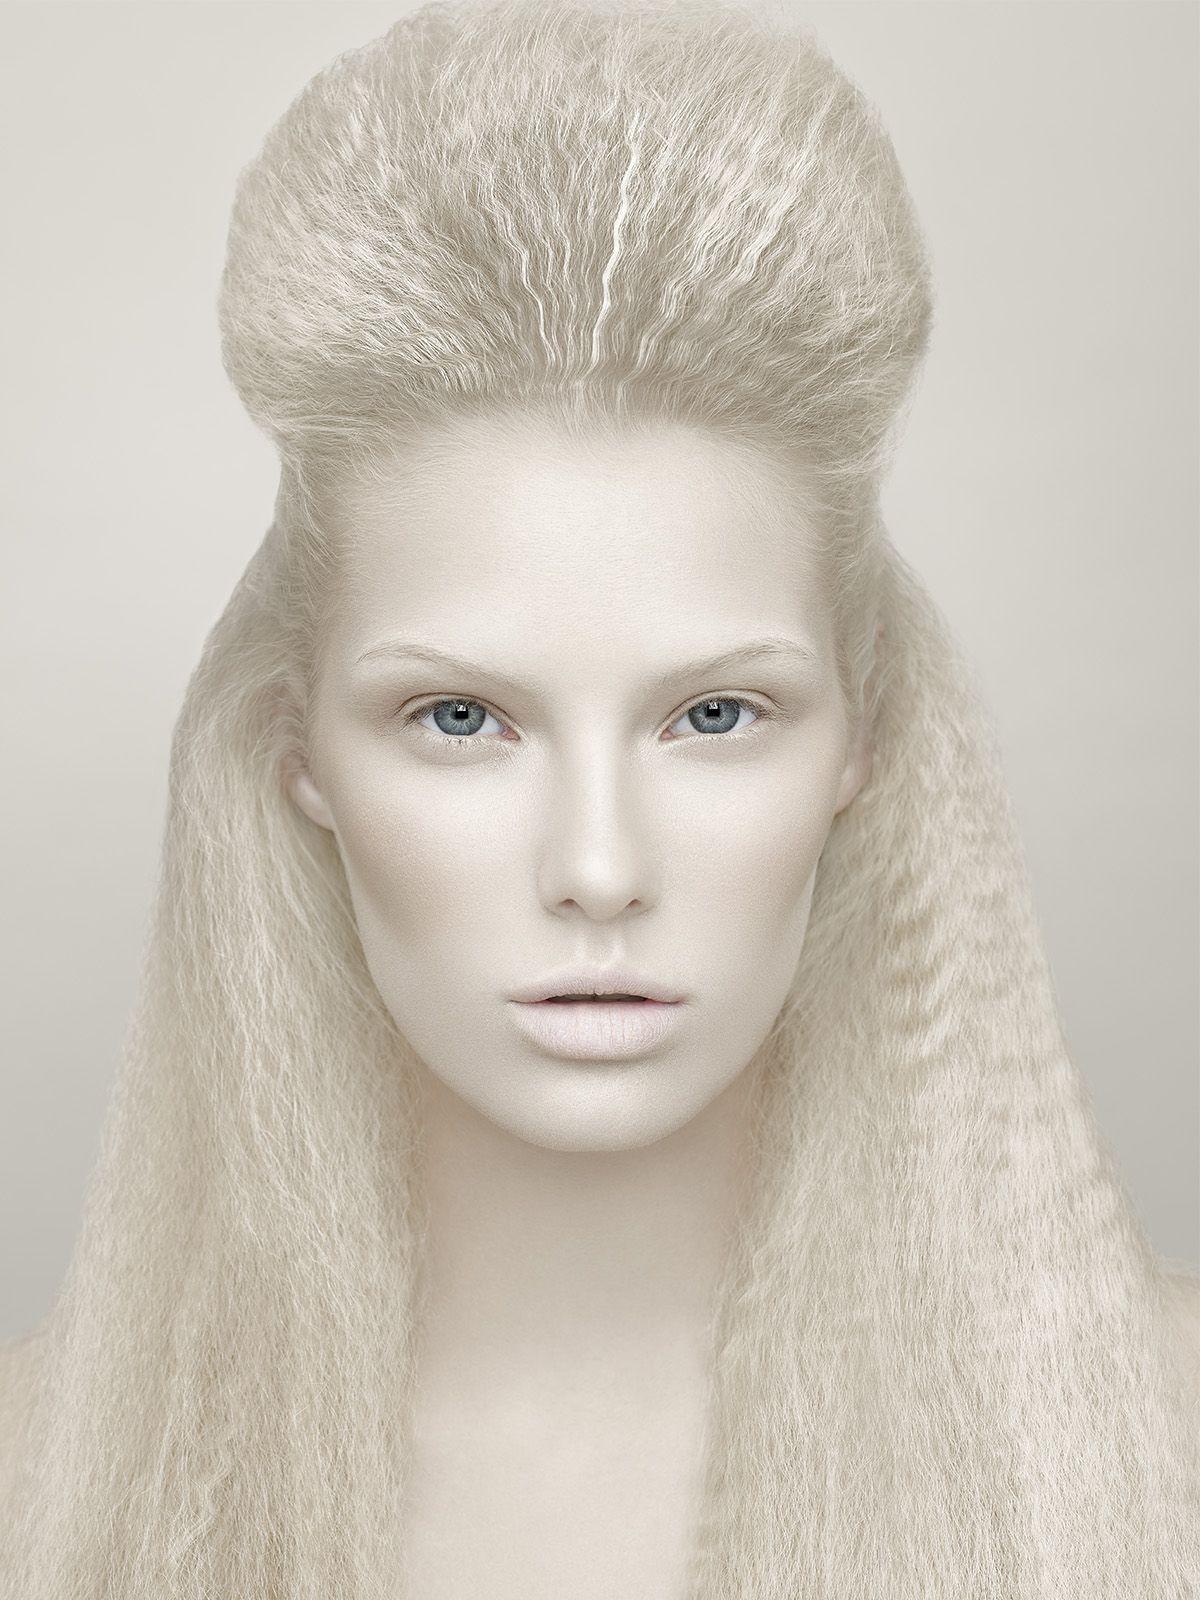 Lemonade braids Naturalhairstyles myriam Coiffure